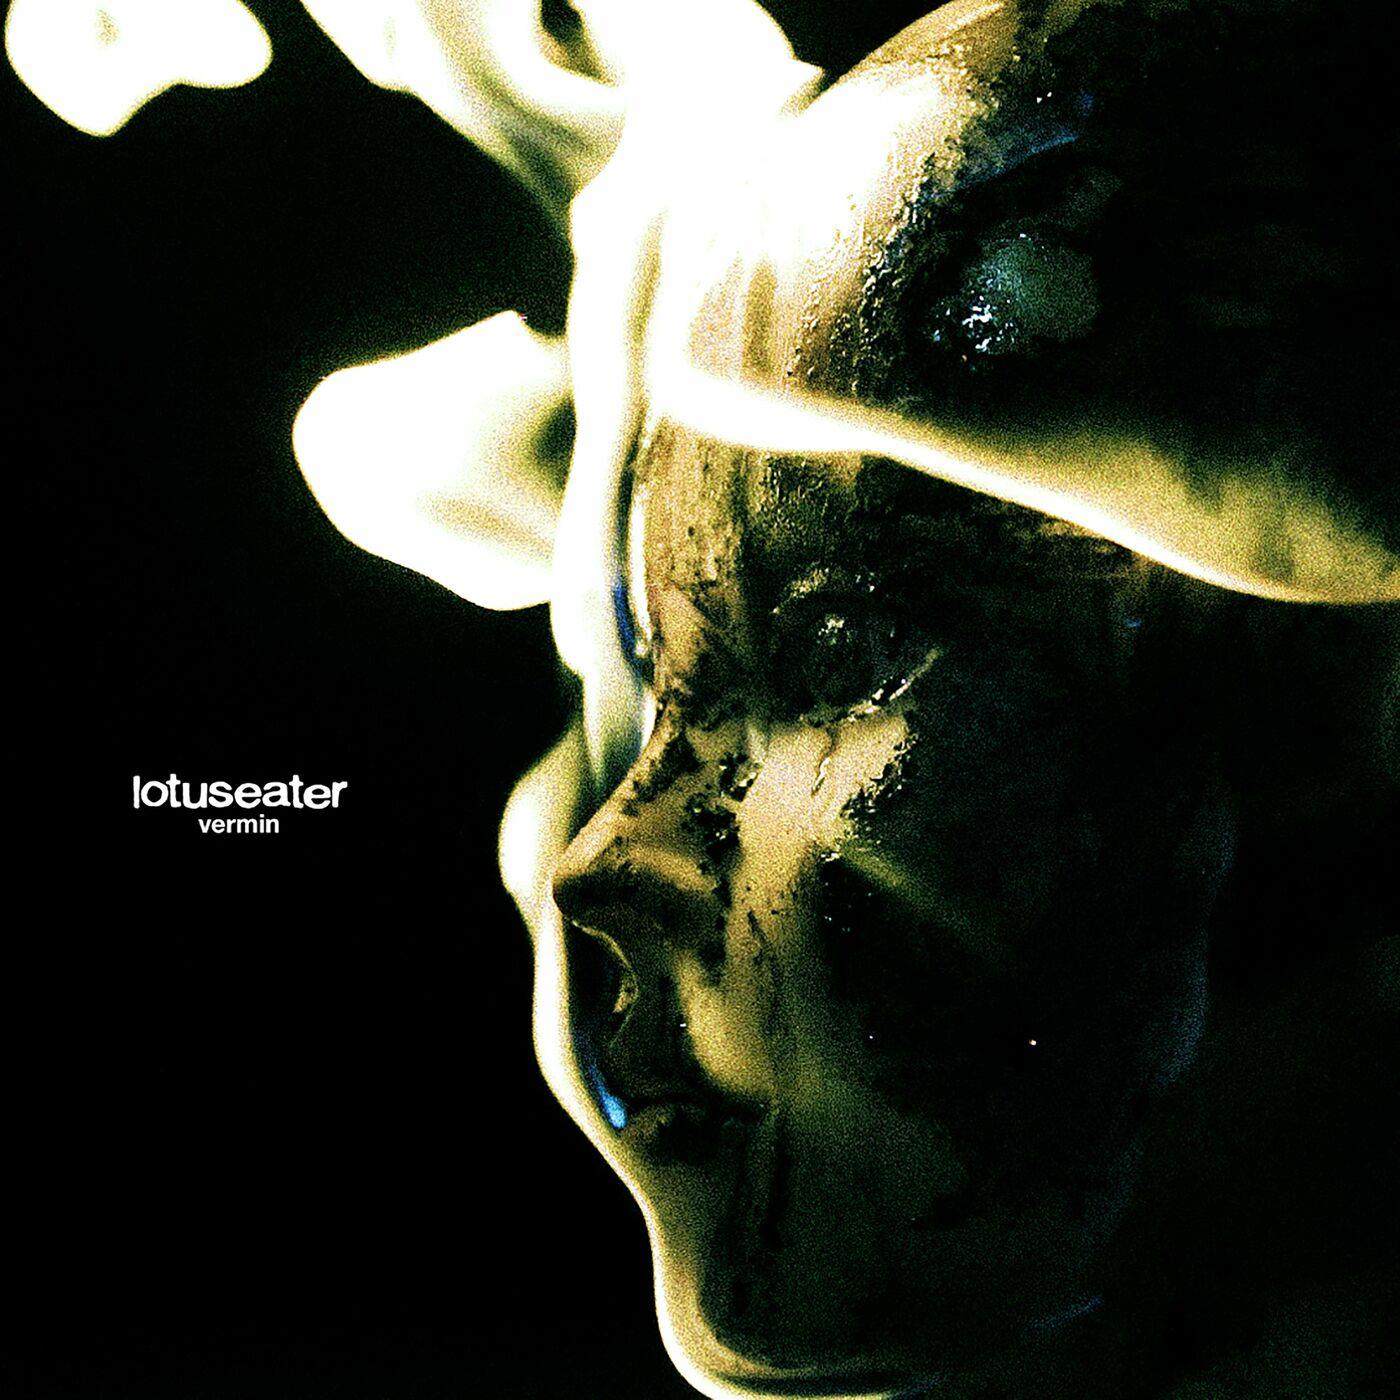 Lotus Eater - Vermin [single] (2021)